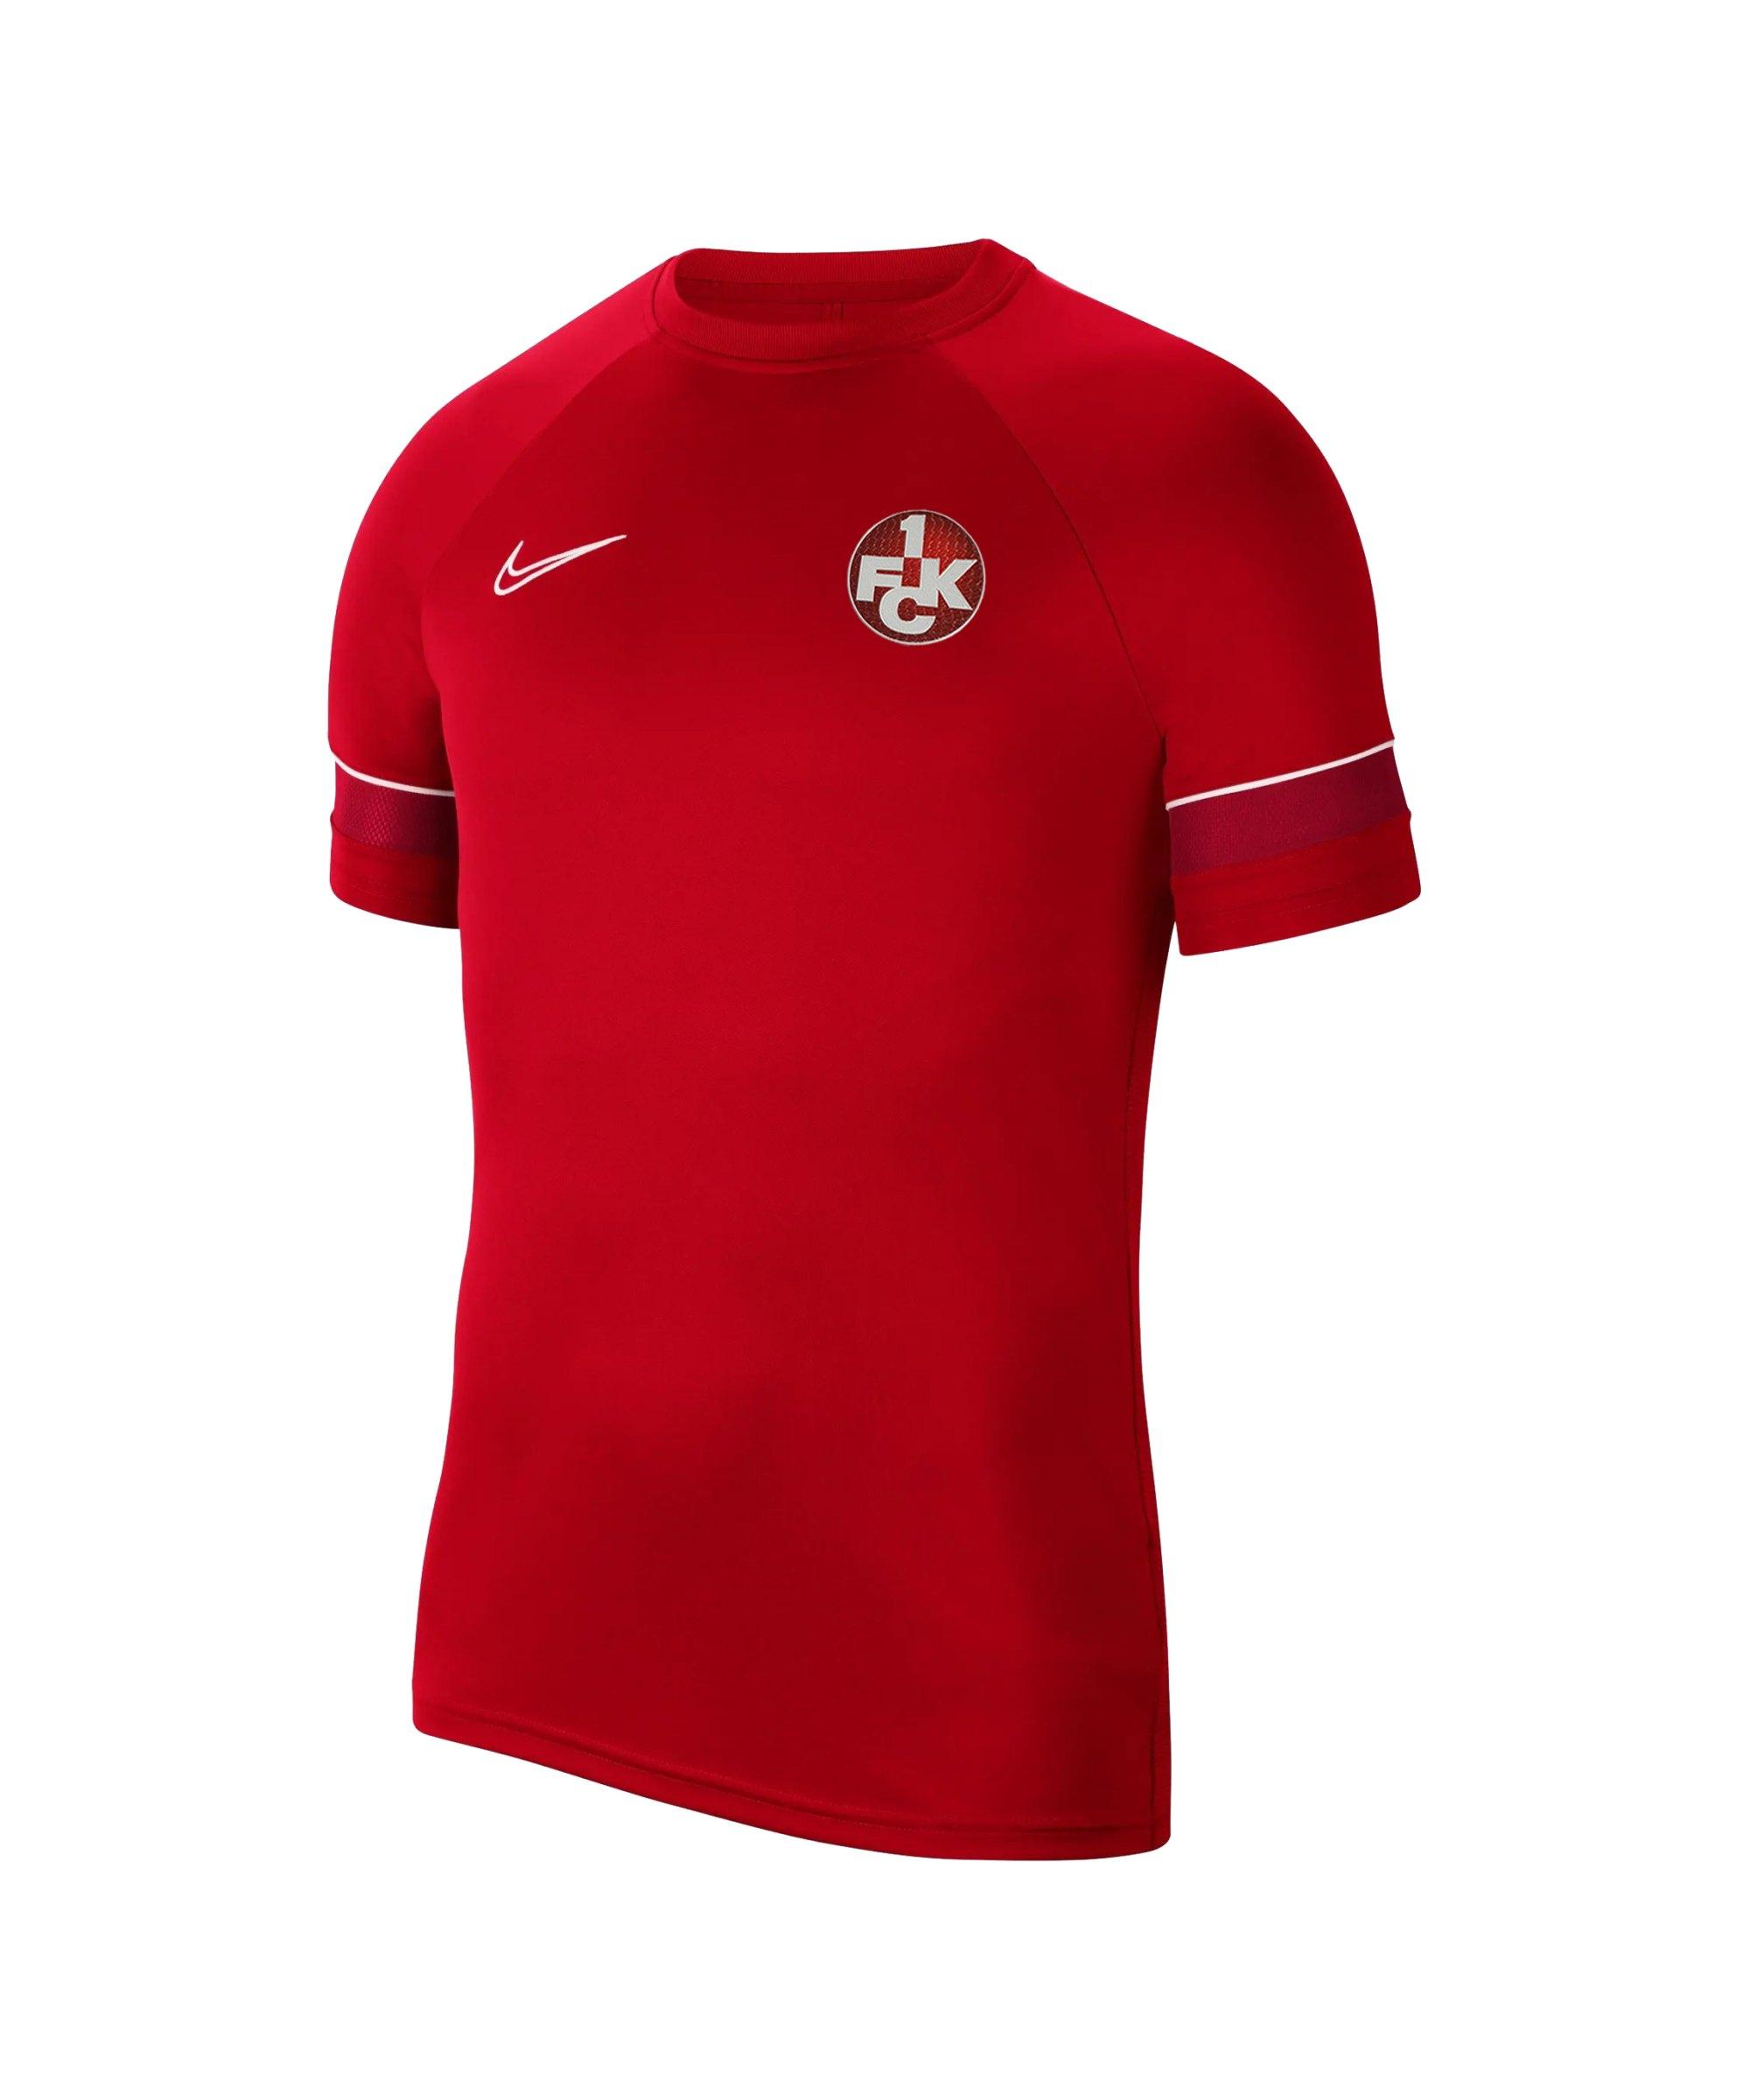 Nike 1. FC Kaiserslautern Trainingsshirt Rot F657 - rot